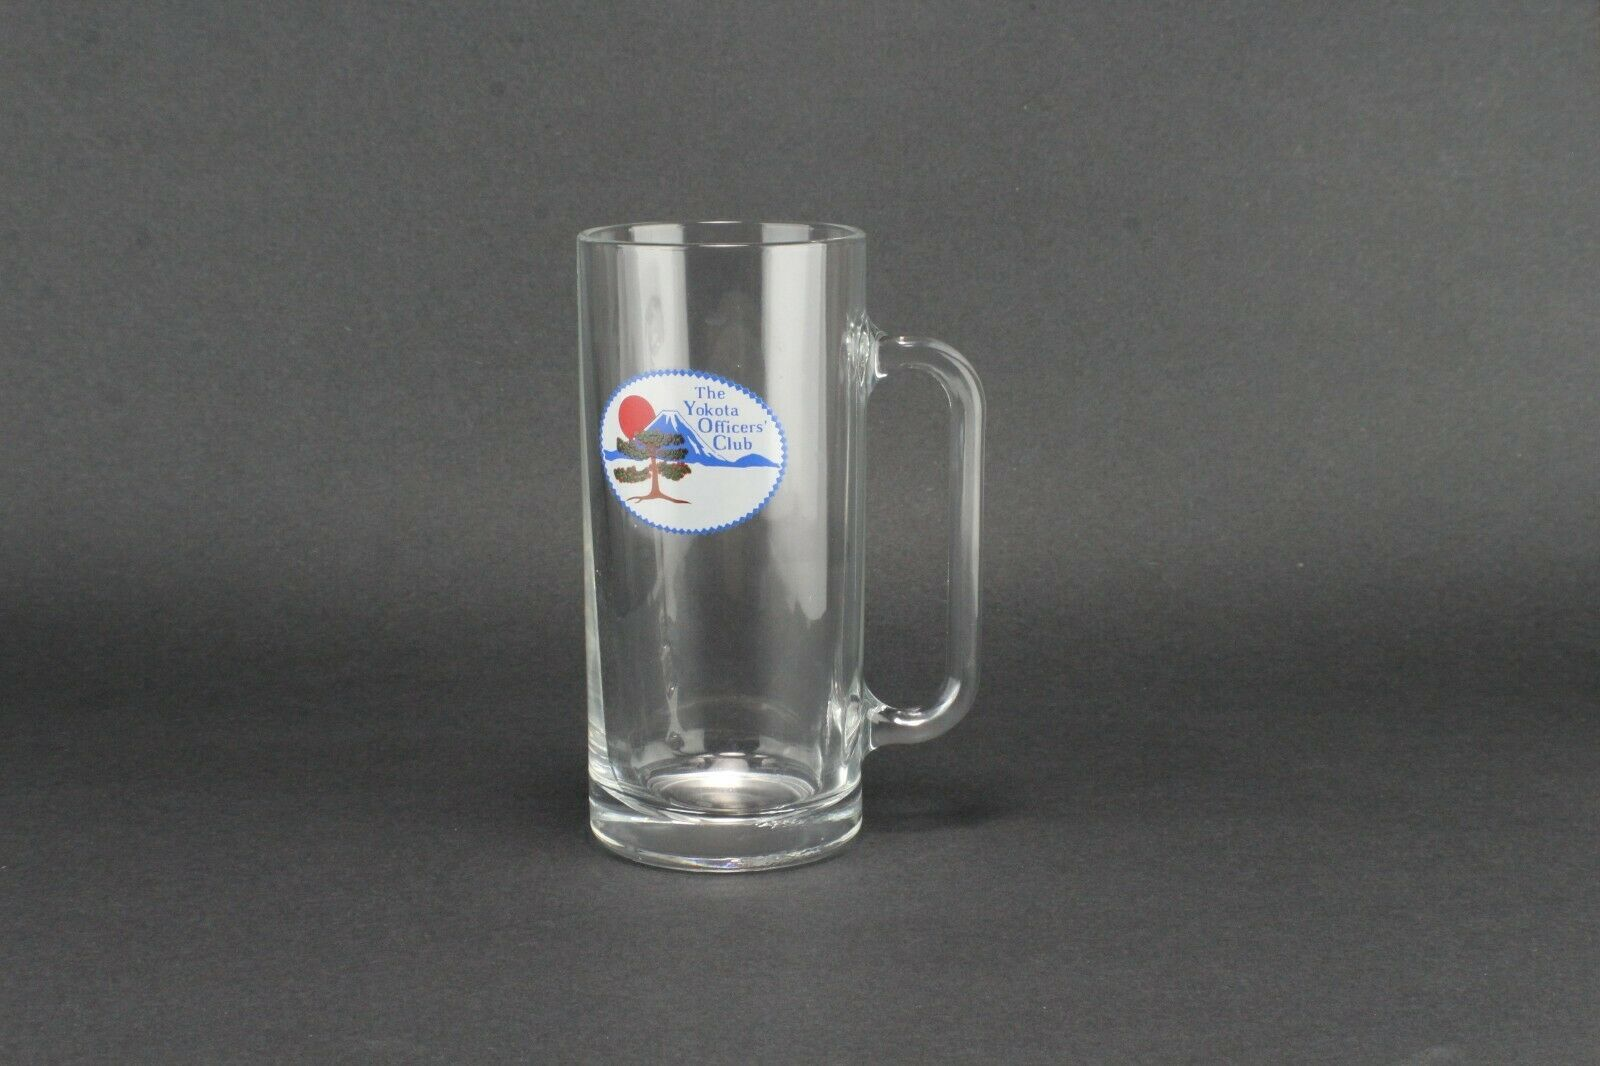 The Yokota Officers Club Glass Mug Air force Club - $18.81